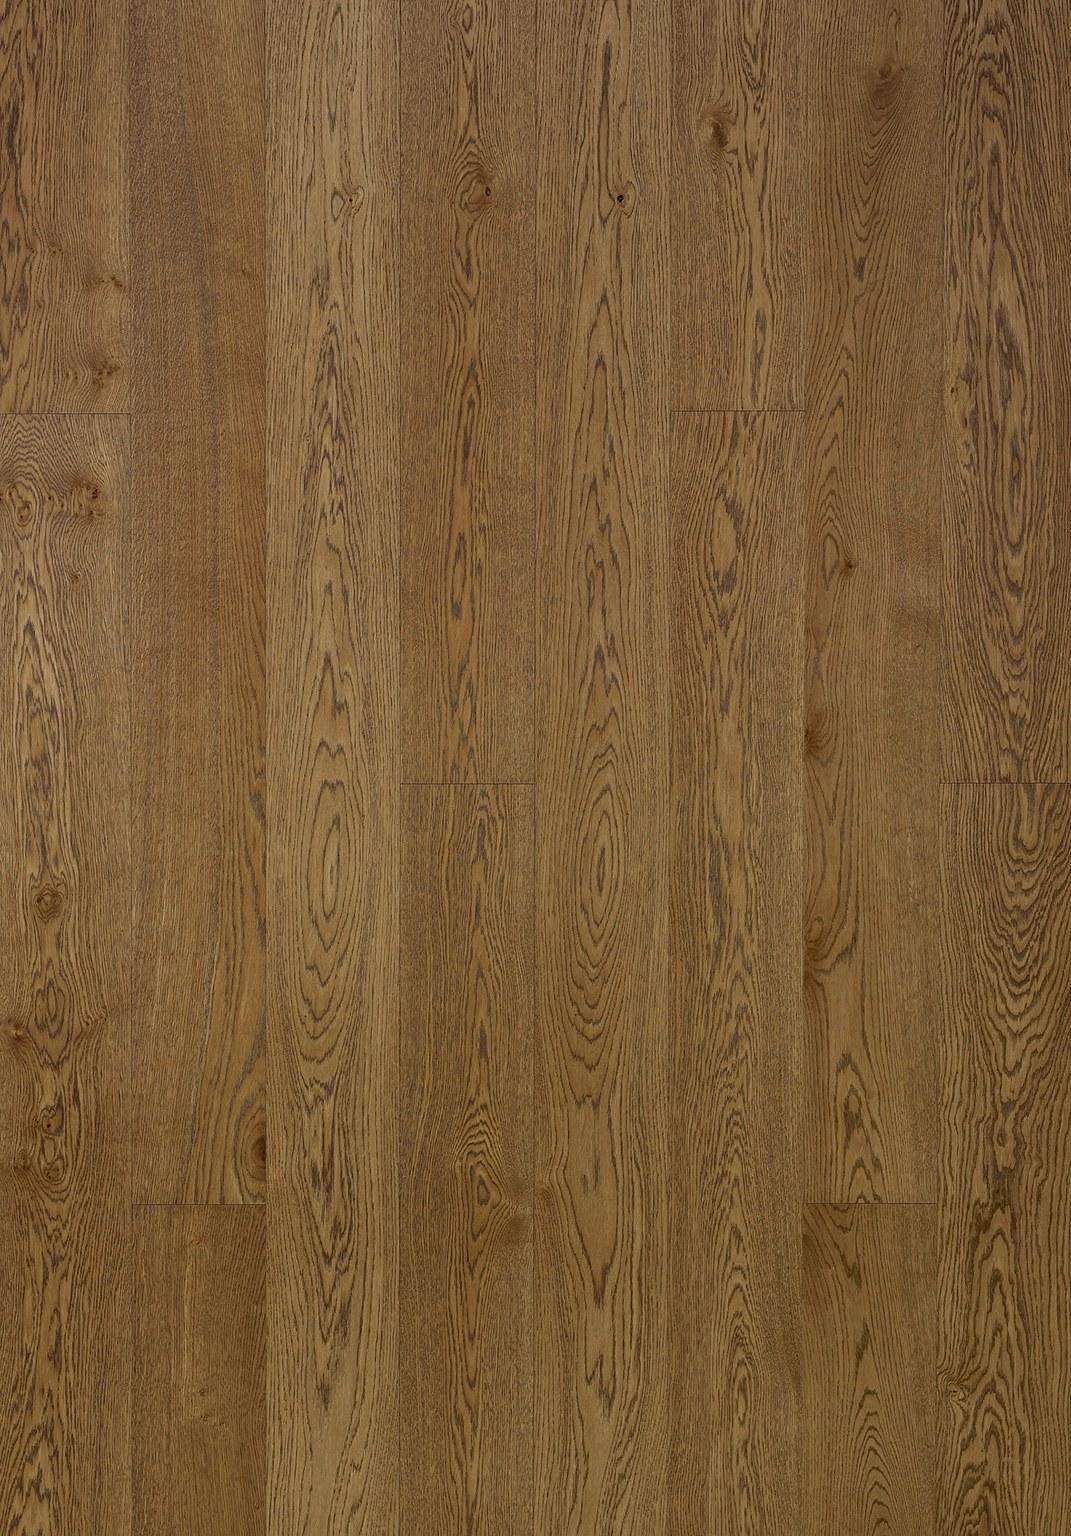 Timberwise Parketti Lankkuparketti Puulattia Wooden Floor Parquet Plank Tammi Oak Cognac 2D1